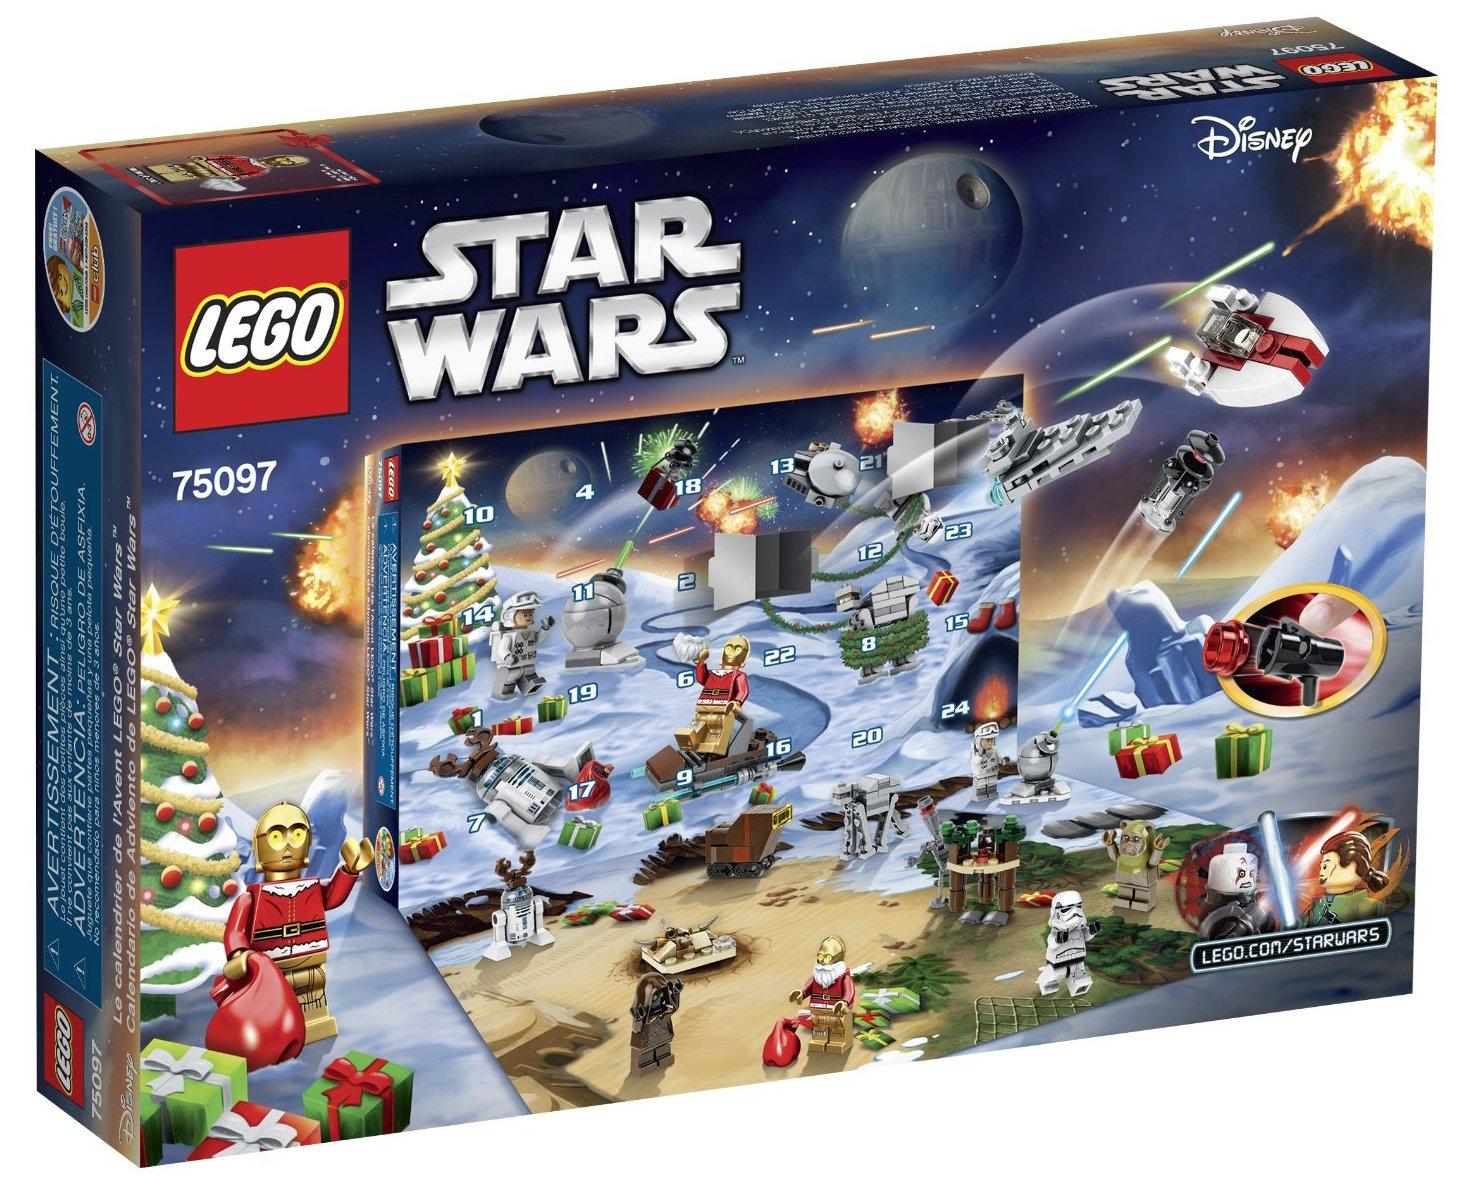 Meanwhile, the LEGO City 2015 Advent Calendar is feeling a little bit ...